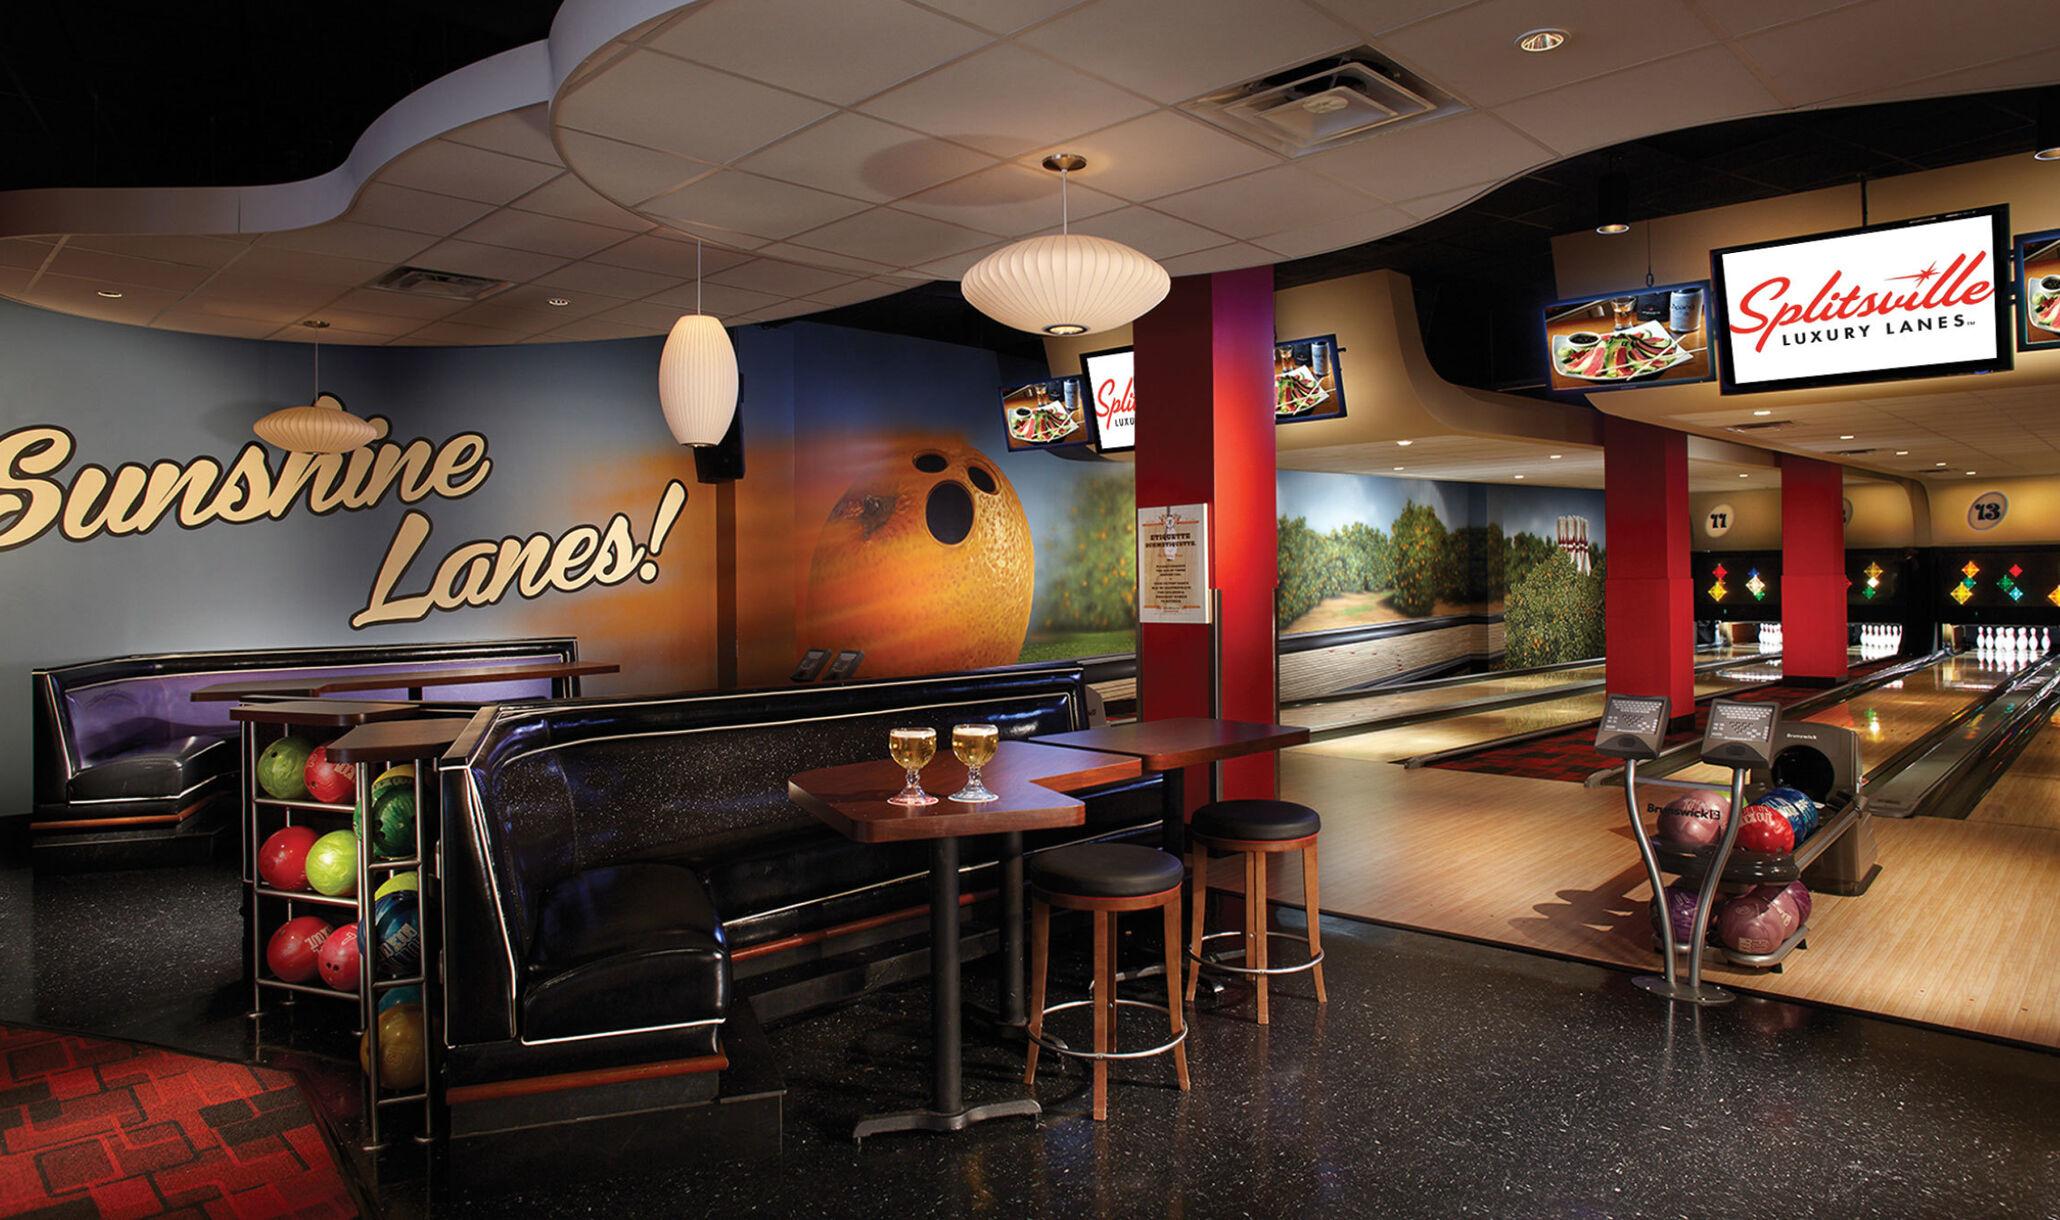 Splitsville Luxury Lanes Brunswick Bowling